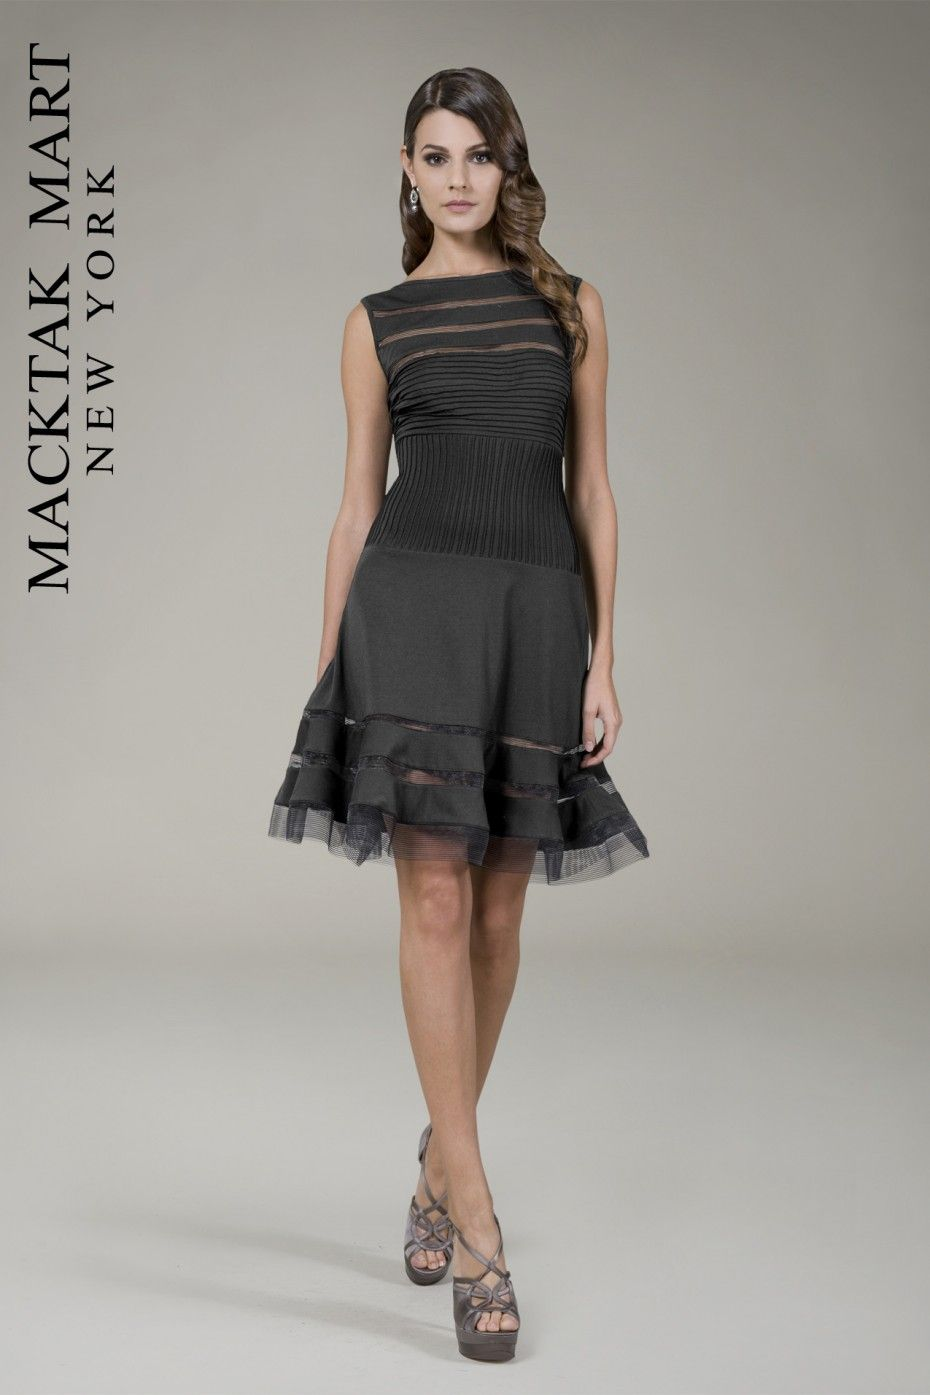 Tadashi Shoji 6l799m Black Dress Tadashi Dress Black Cocktail Dress Dresses [ 1395 x 930 Pixel ]